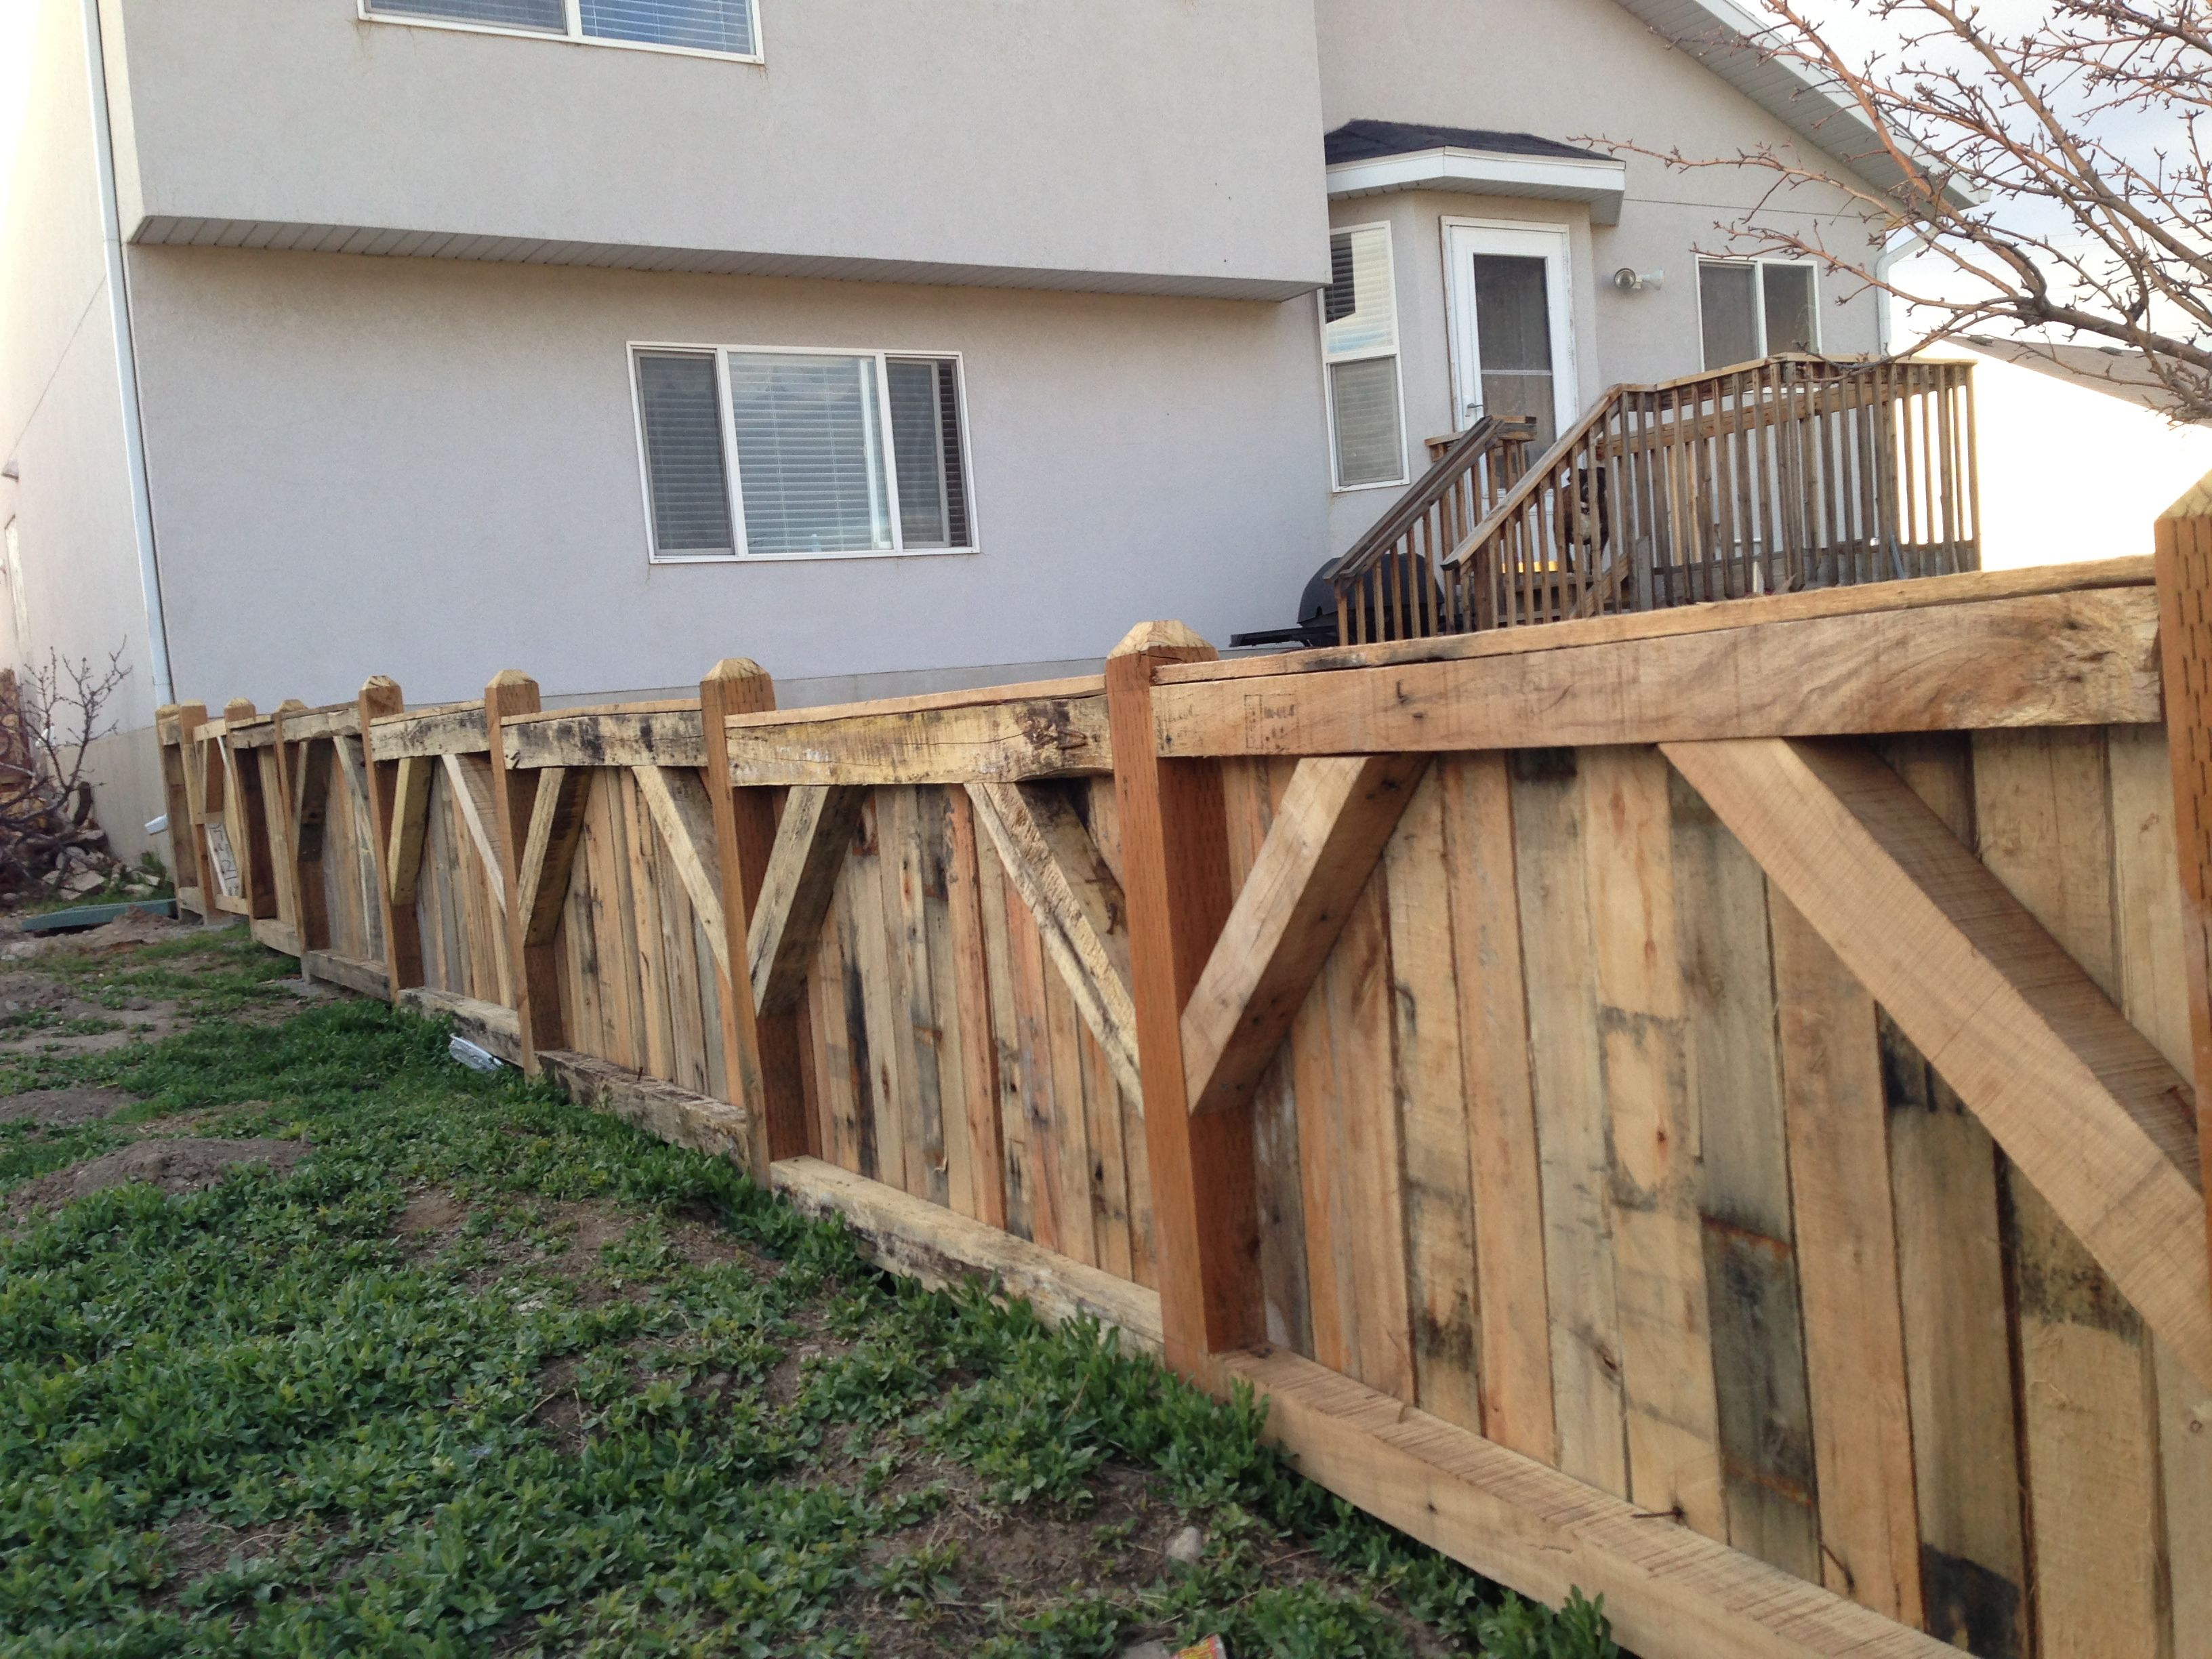 Pallet fence | Pallet ideas | Pinterest